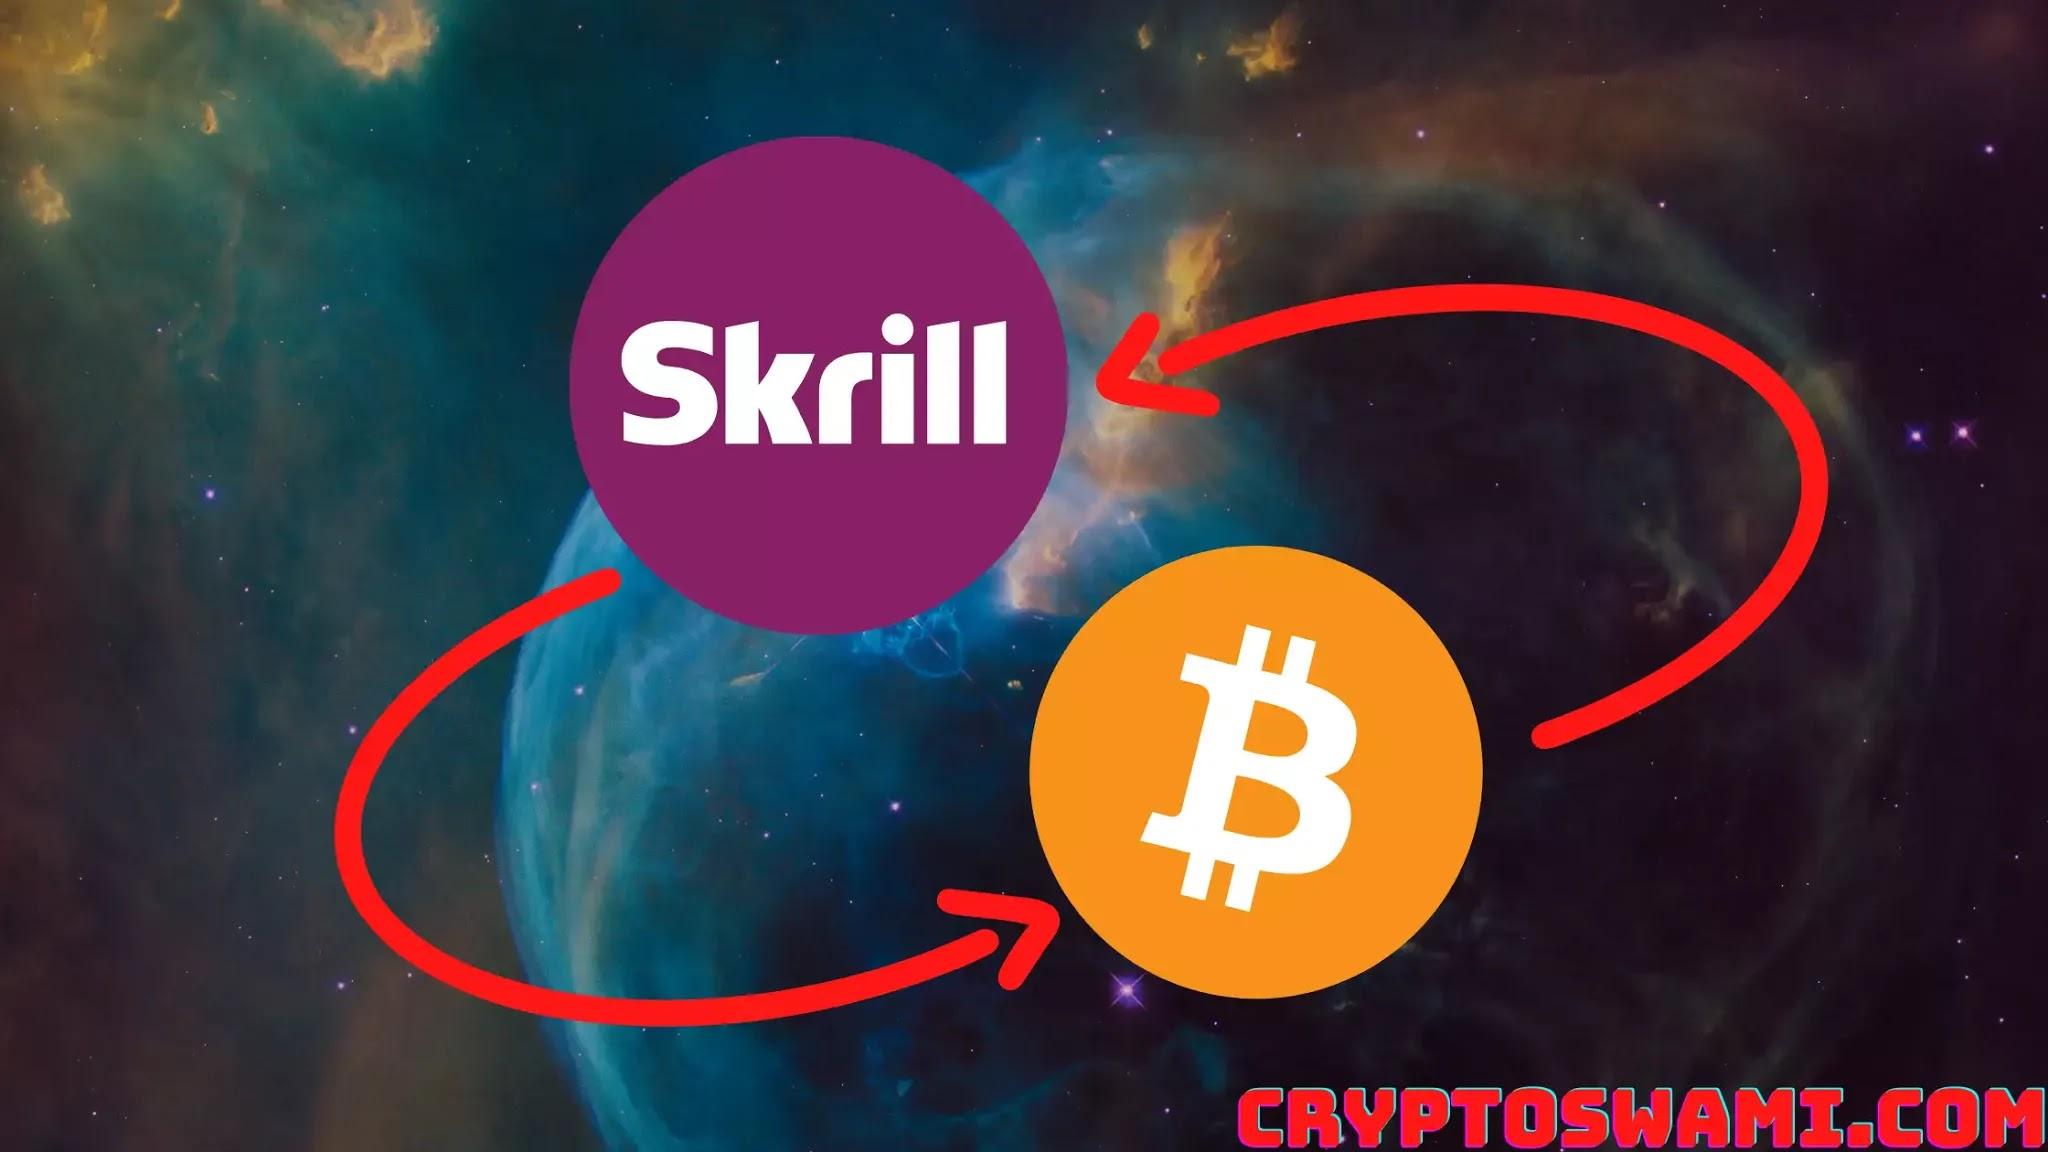 Skrill To Bitcoin - How To Buy Bitcoin With Skrill